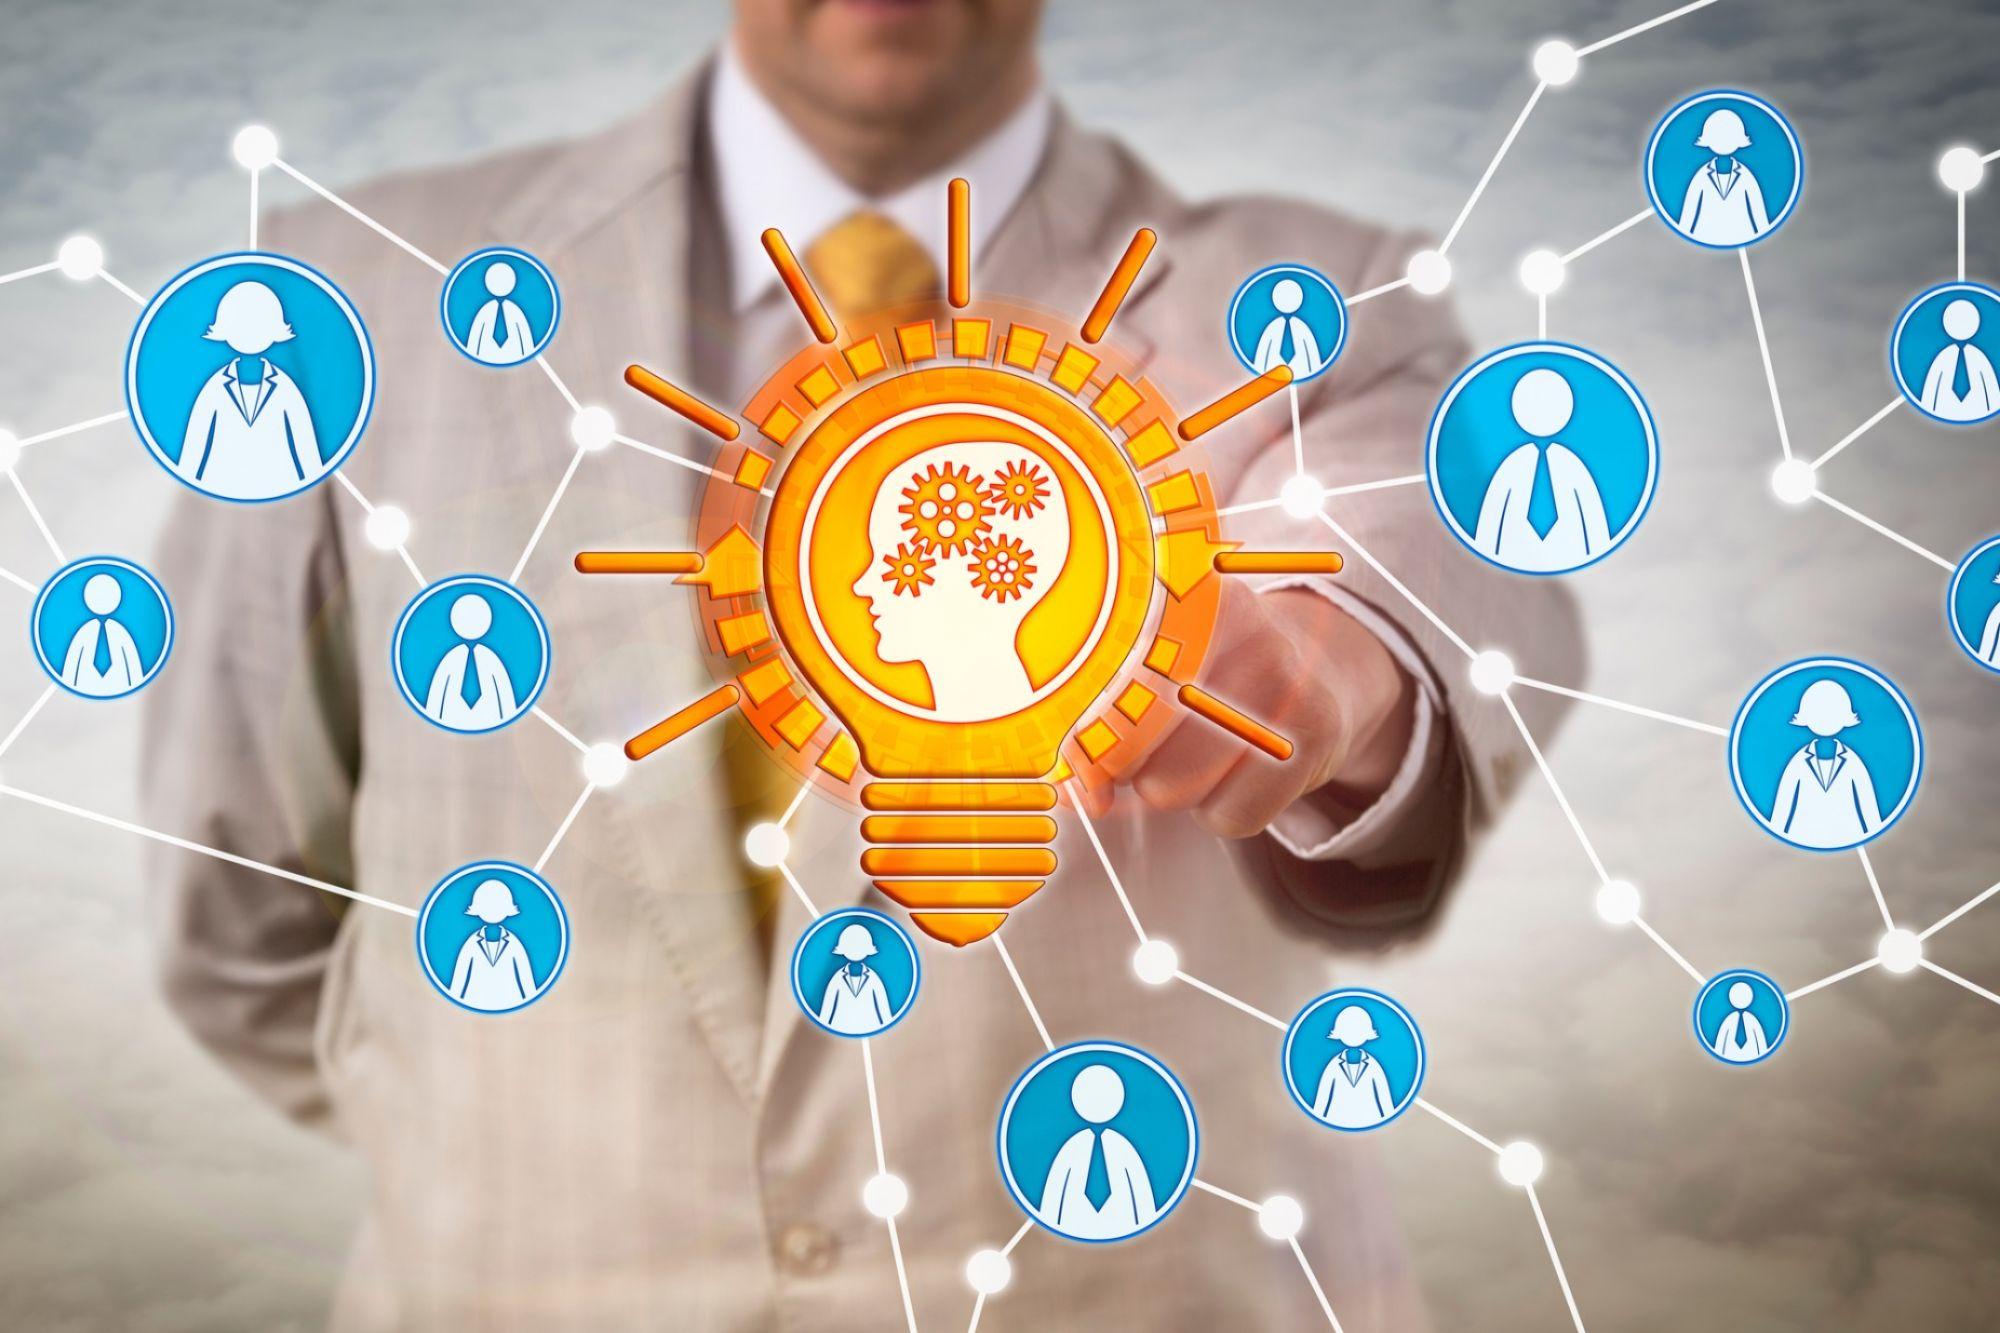 entrepreneur.com - Suhail Al-Masri - AI: The New Engine Of HR